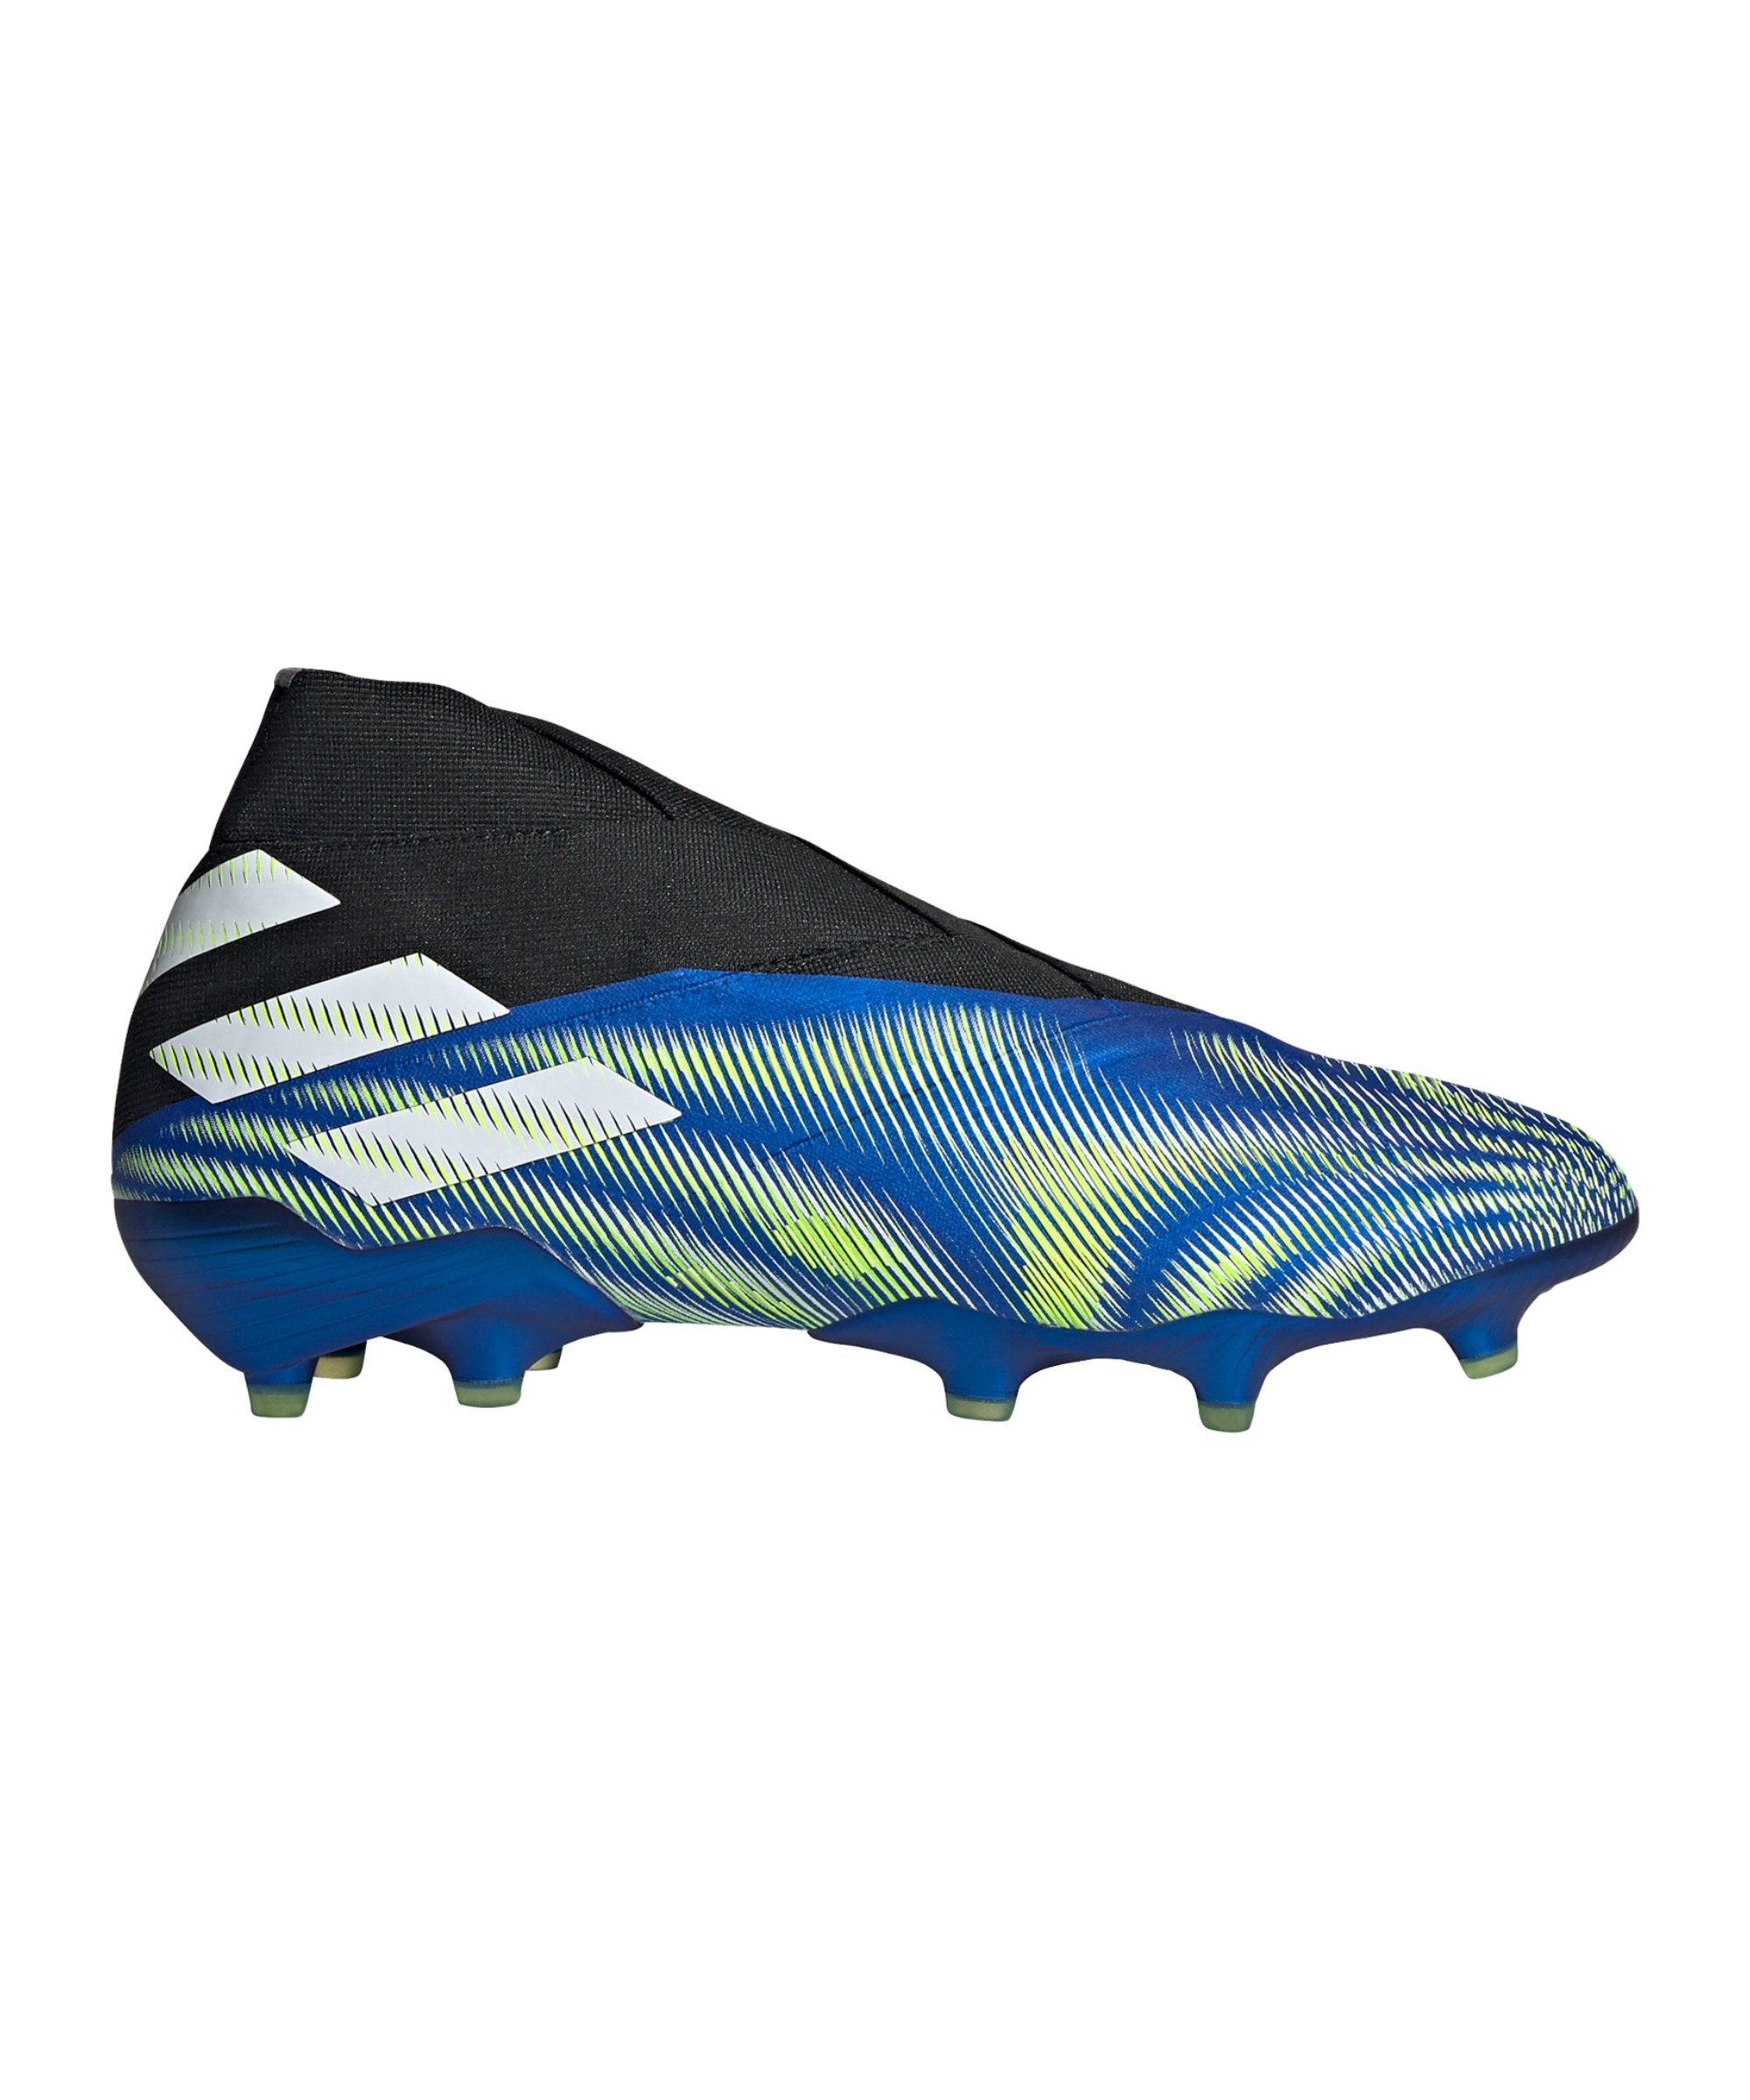 adidas NEMEZIZ+ FG Superlative Blau Weiss - blau